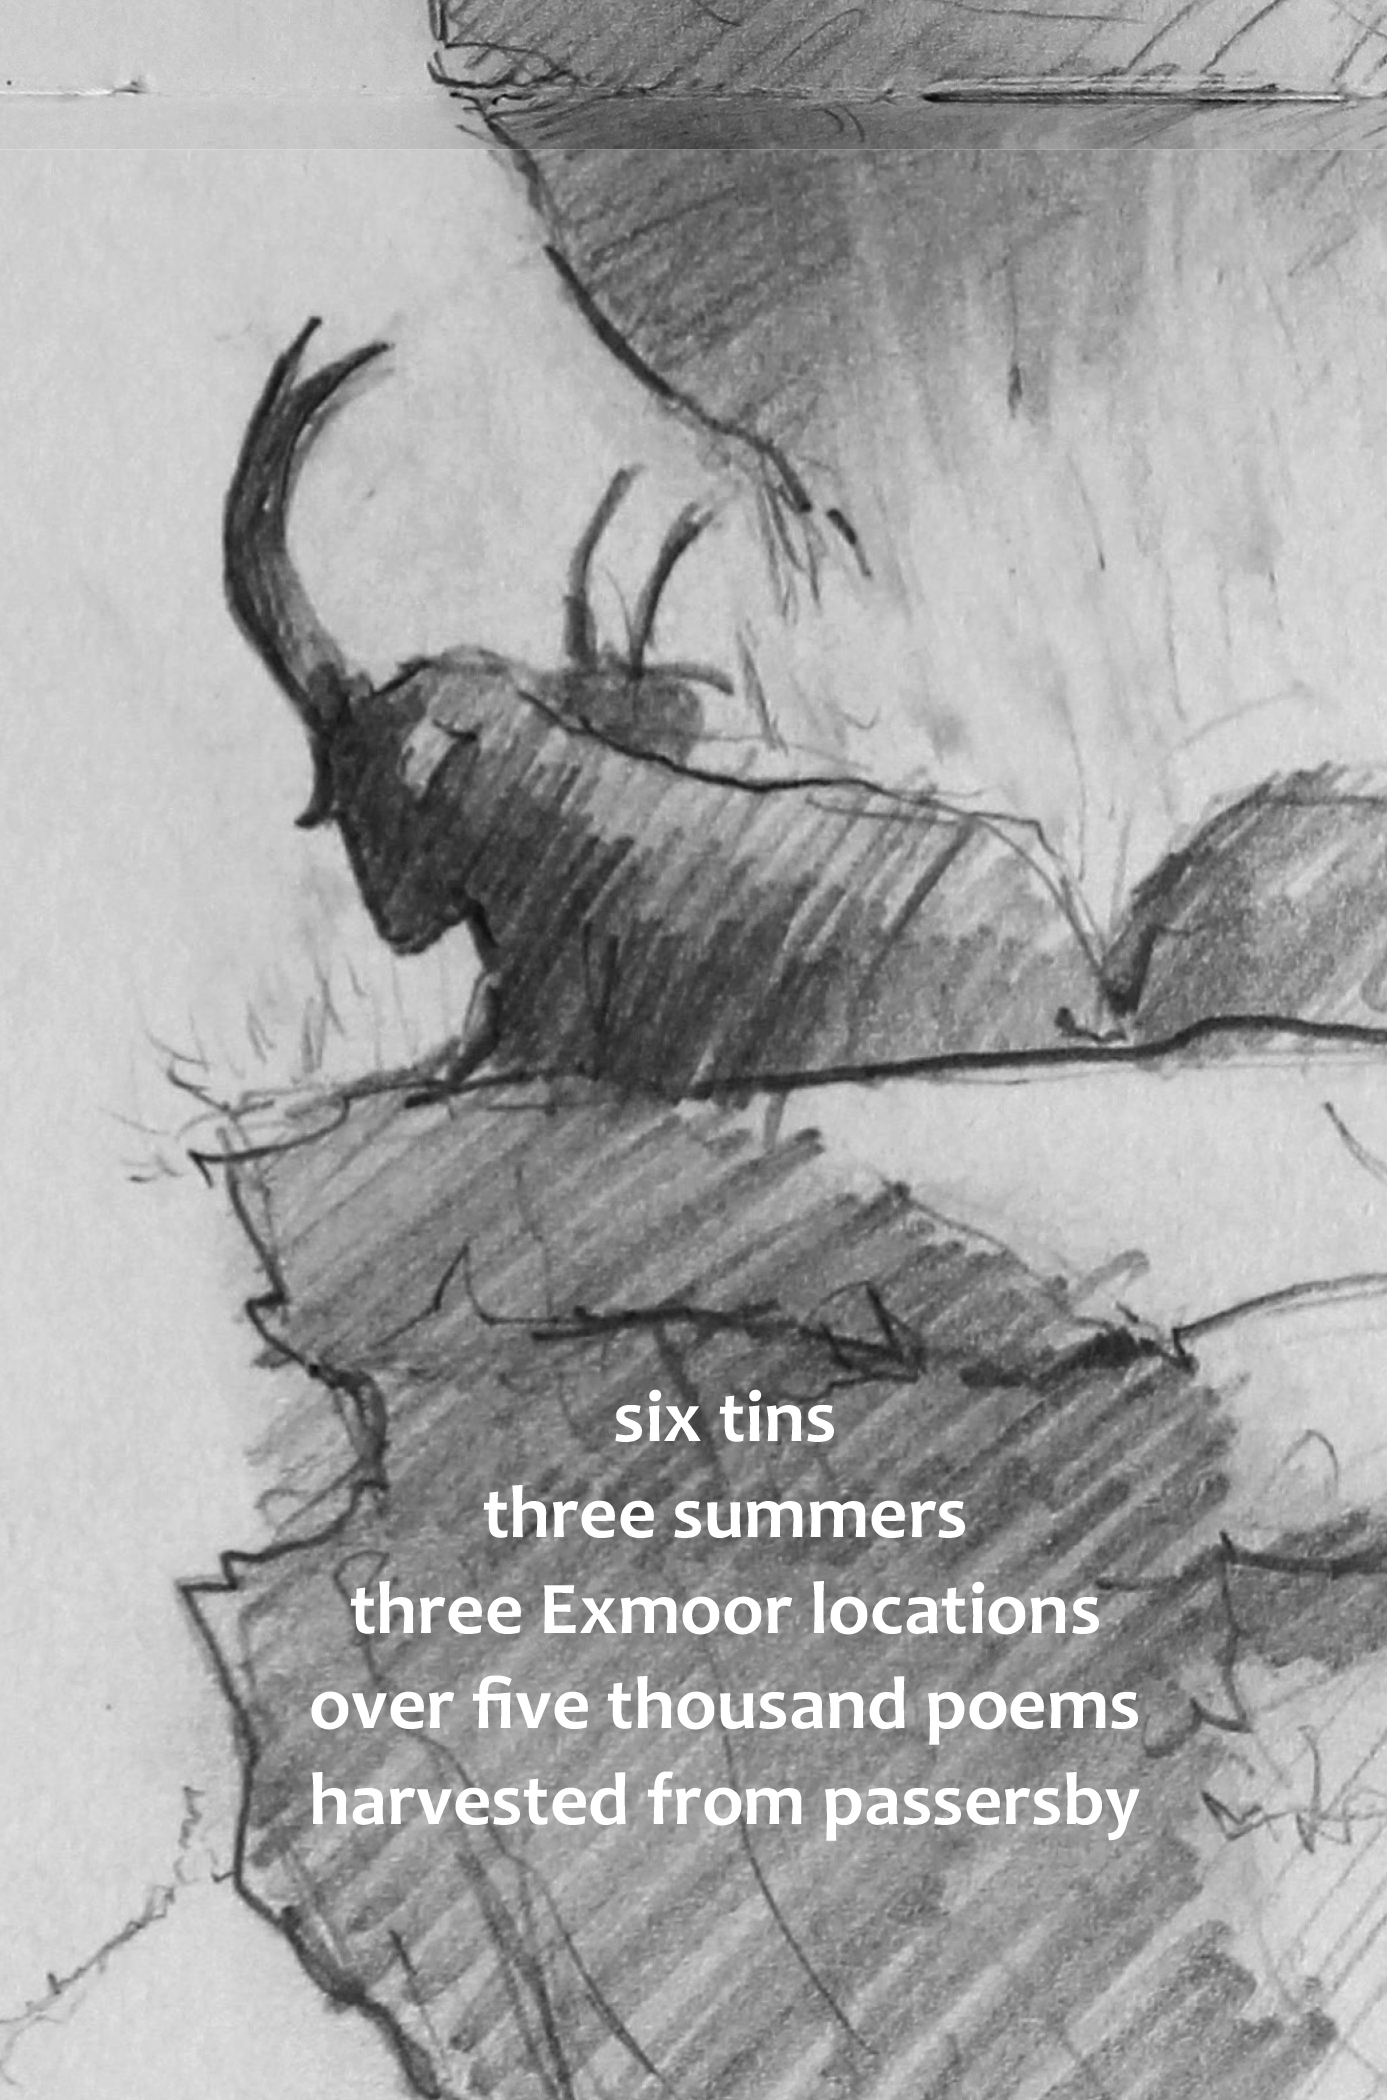 Exmoor Poetry Boxes